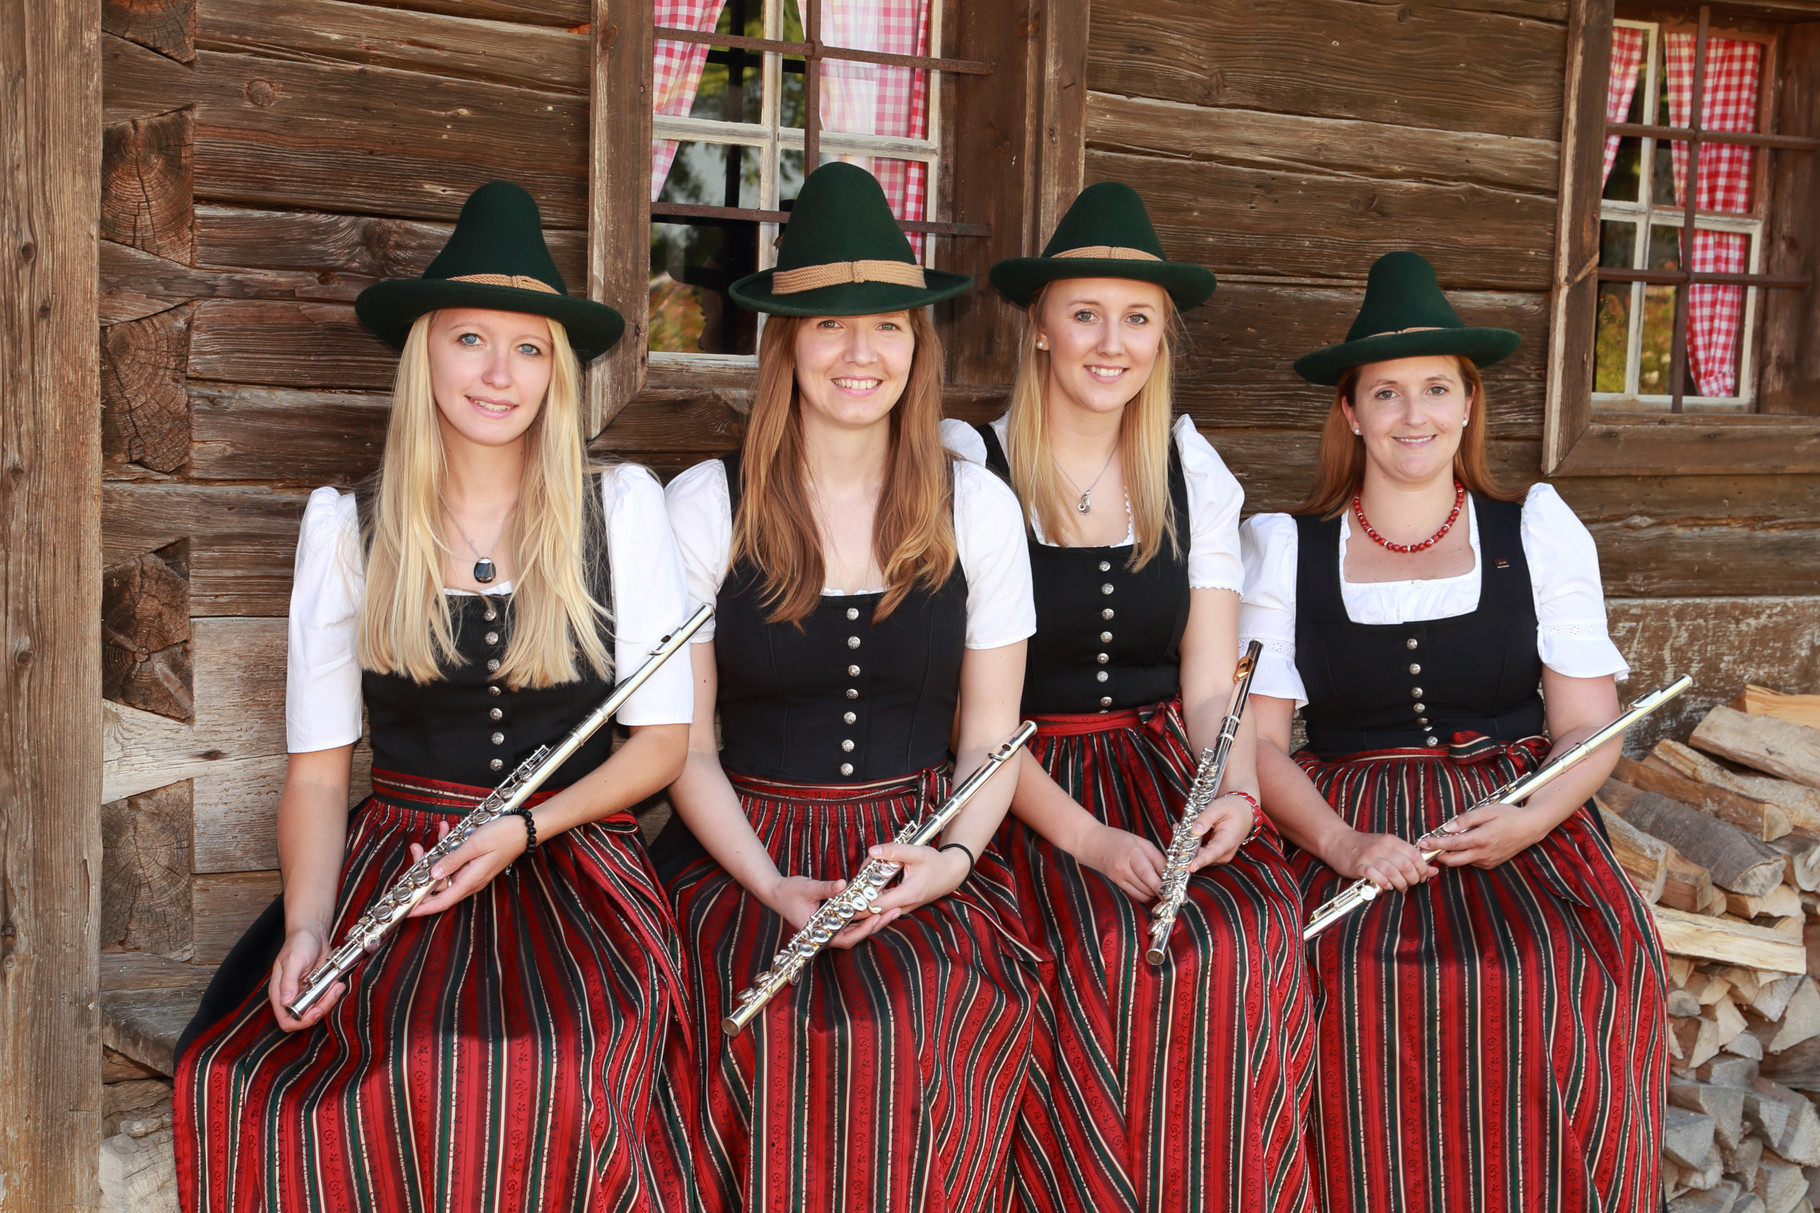 Alexandra Steiner, Petra Dicker, Nina Grünbacher, Caroline Steiner